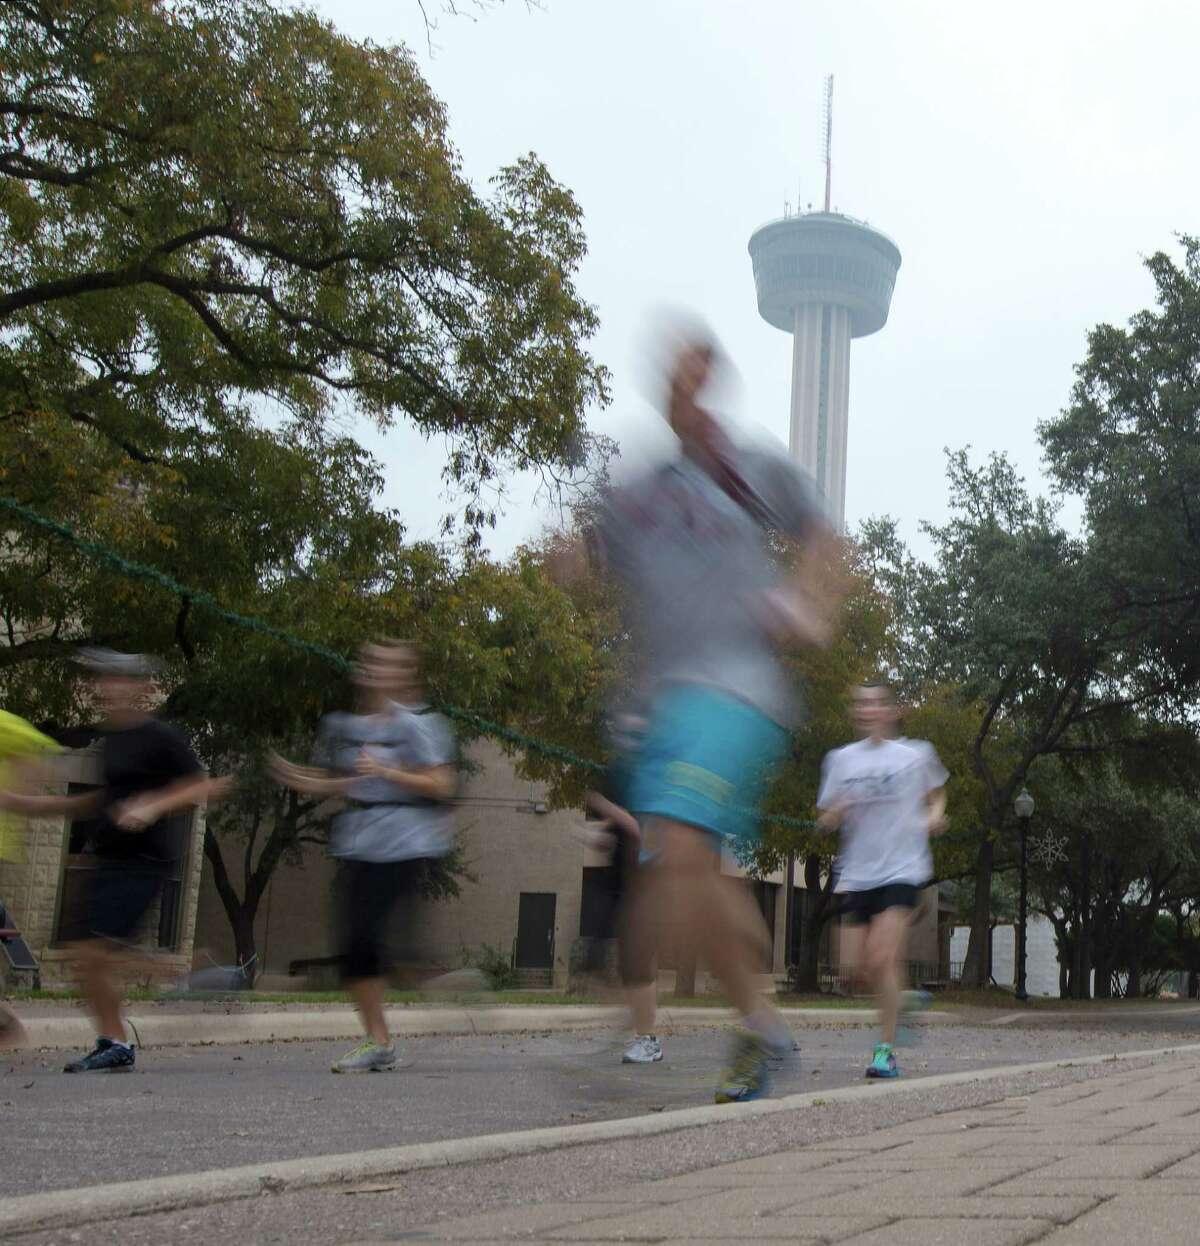 Through July 28: River City Run - 5K Running Tour of San Antonio, www.rivercityrunsa.com